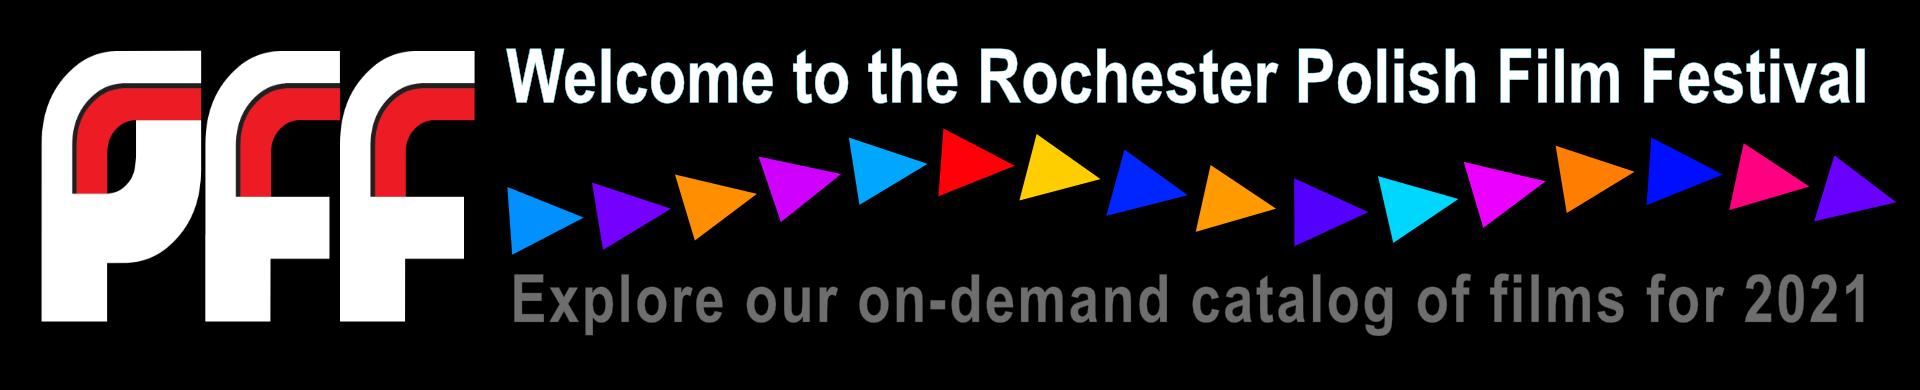 Rochester Polish Film Festival